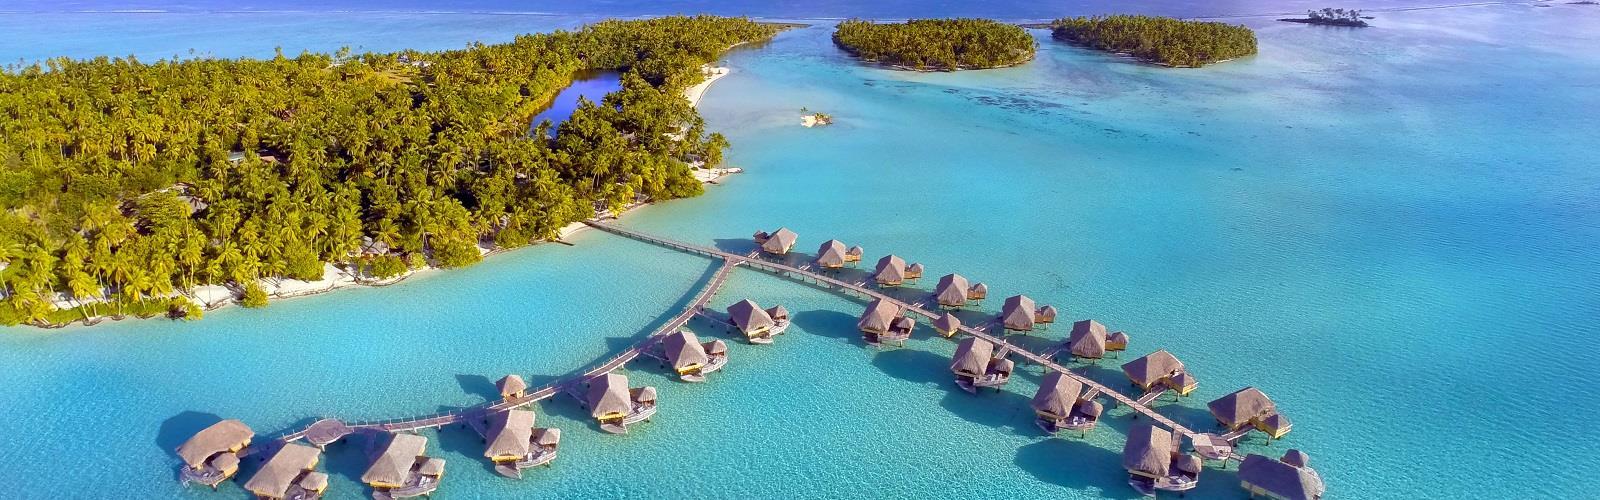 Le Tahaa Island Resort & Spa Panoramablick